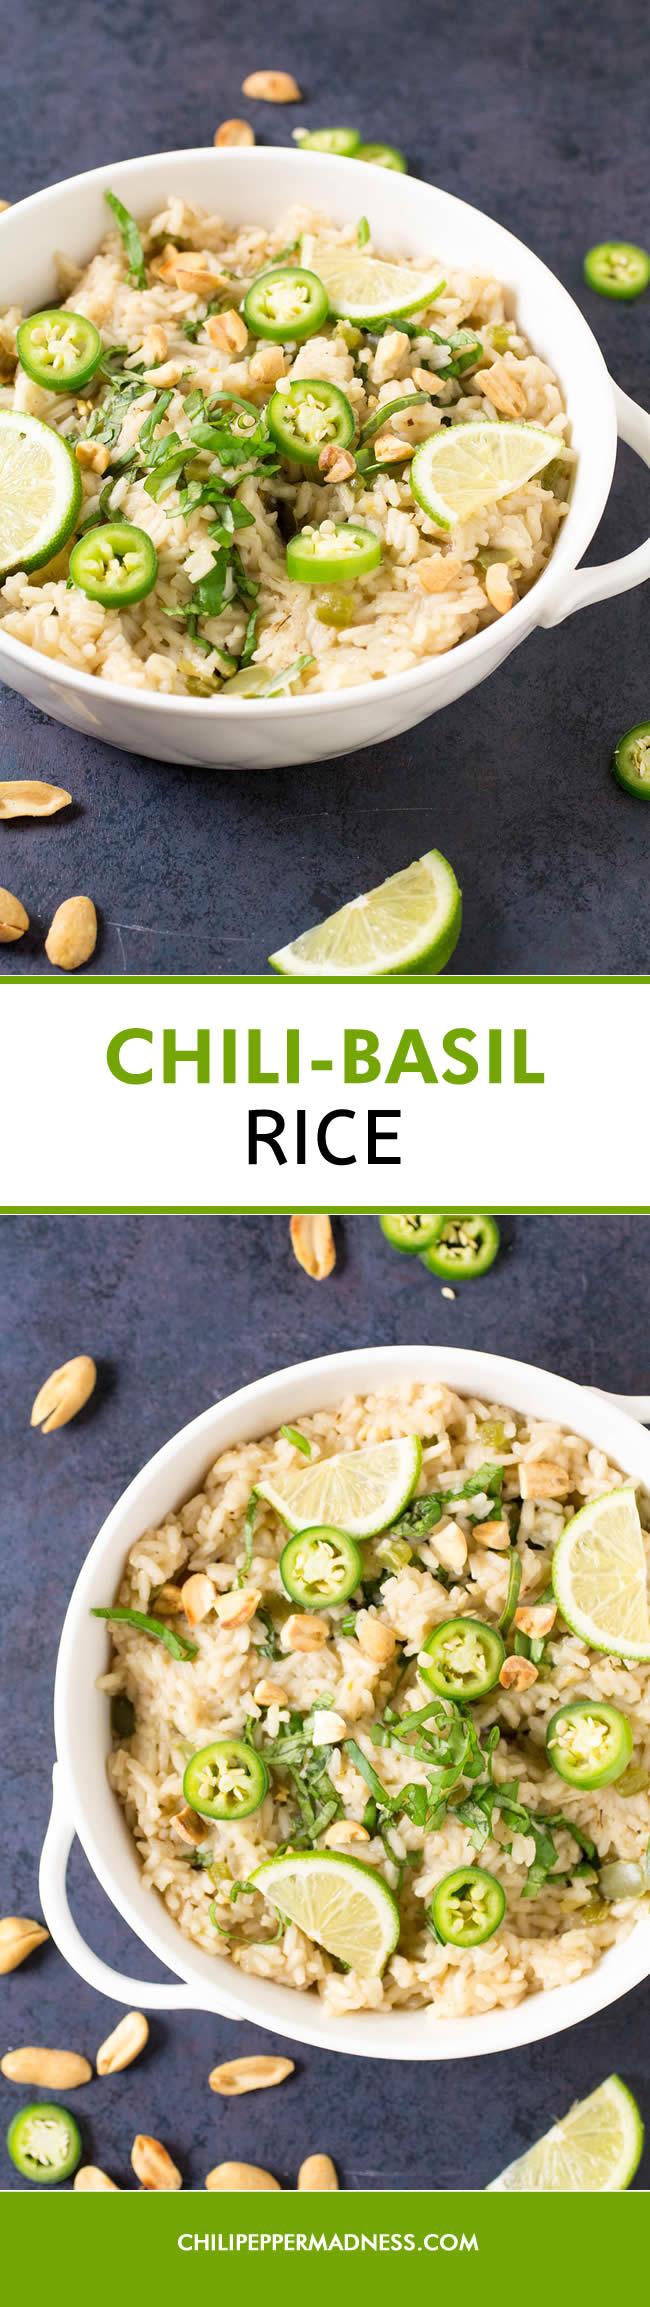 Chili-Basil Rice - Recipe